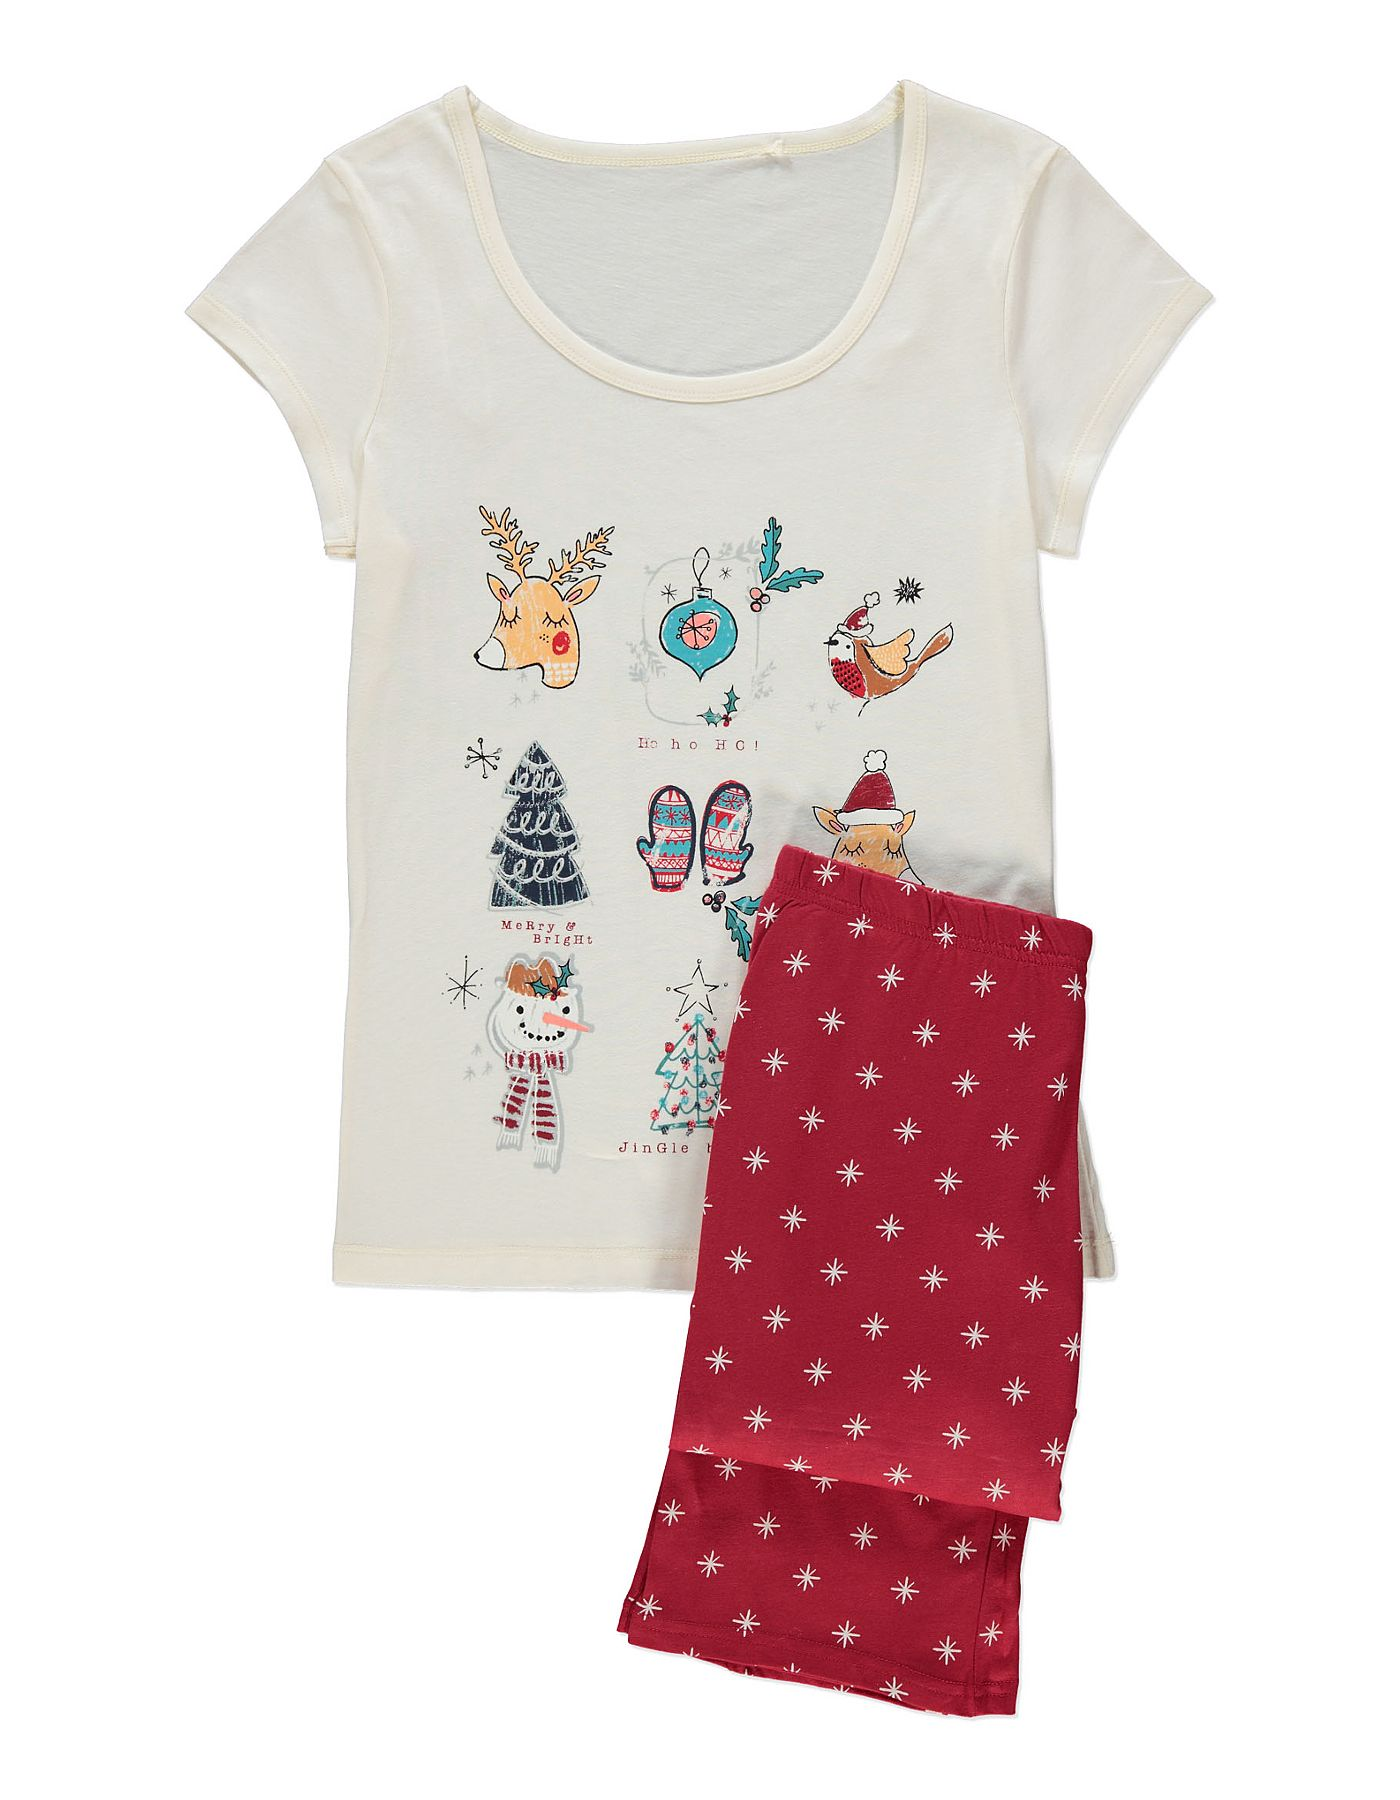 Christmas Pyjama Set Women George At Asda In 2020 Christmas Pajama Set Pajama Set Women Christmas Pajamas